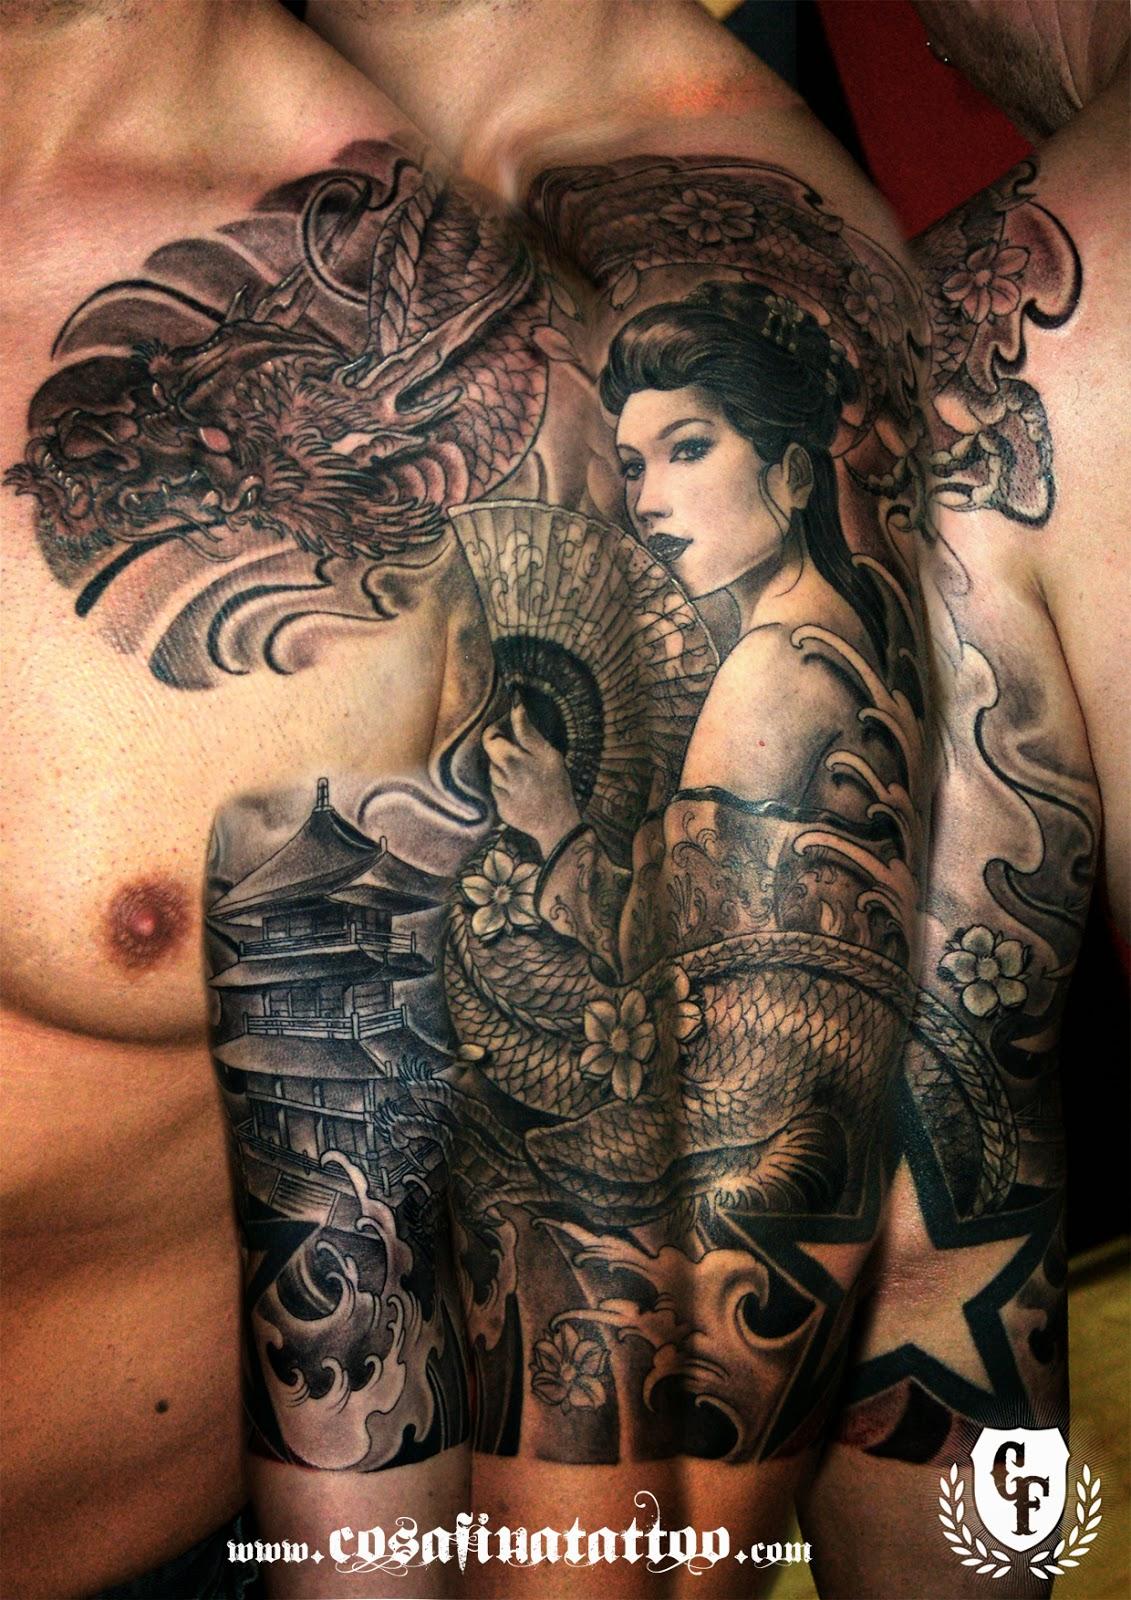 Tattoo Brazo Hombre Japones cosafina tattoo carlos art studio: tatuaje japones oriental yakuza